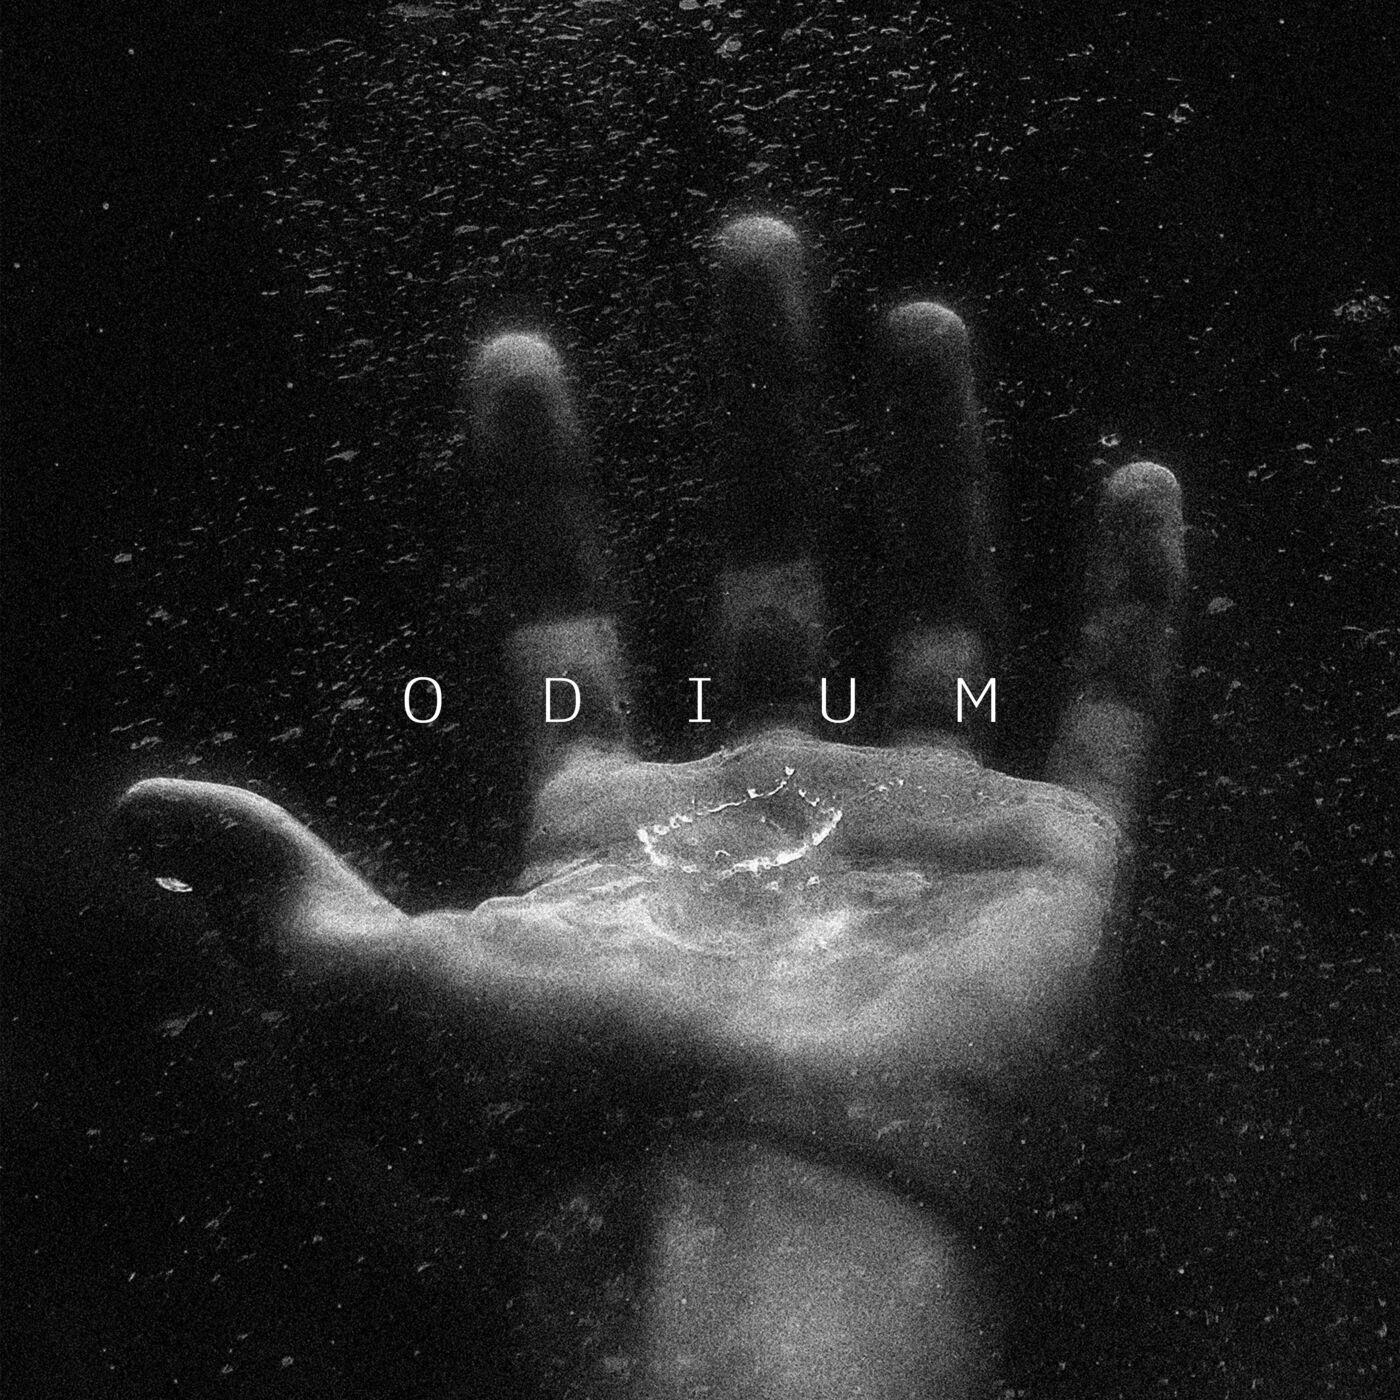 Allt - Odium [single] (2020)